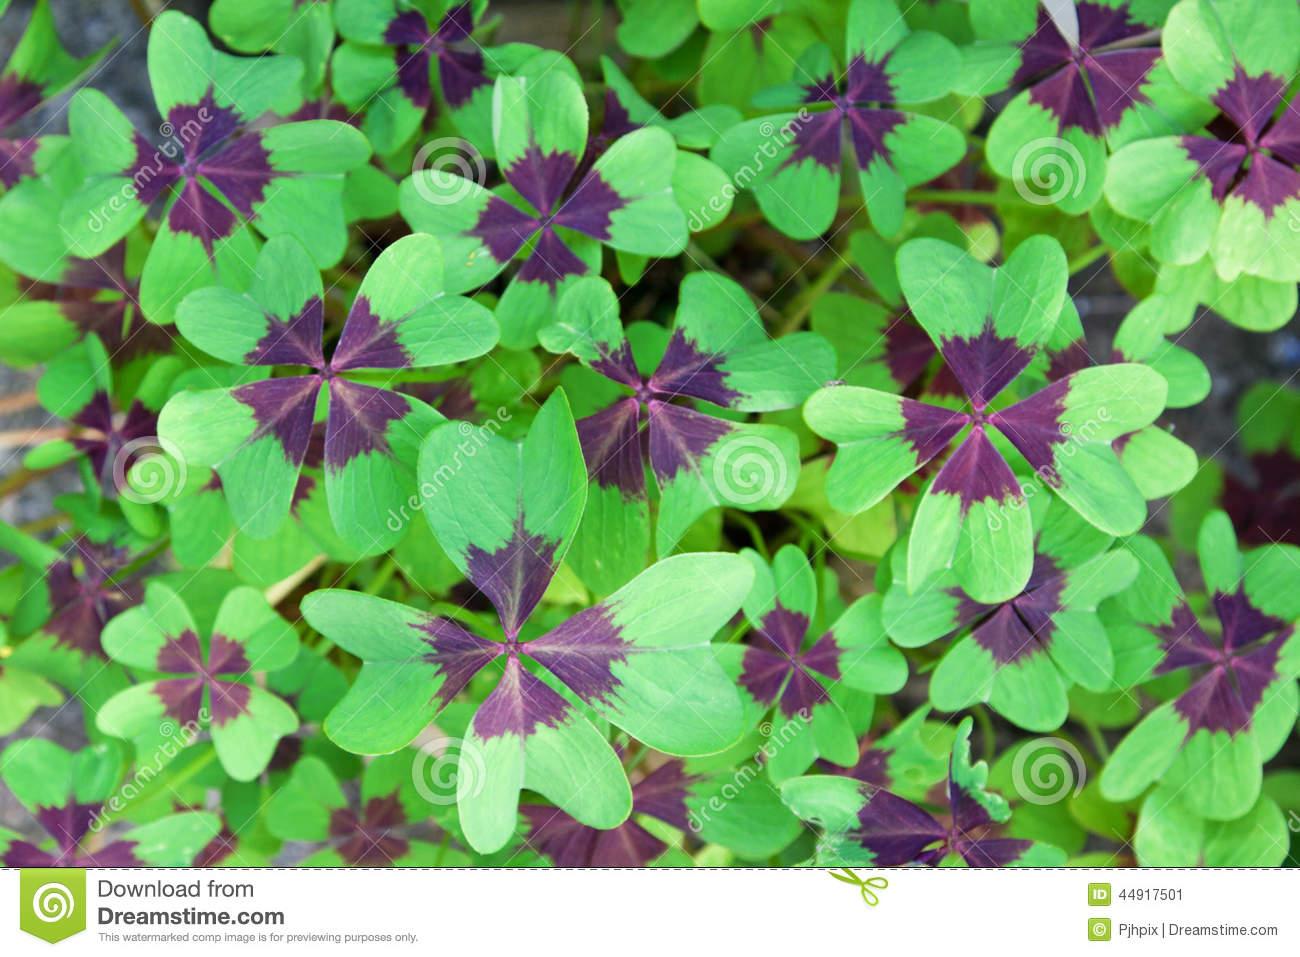 Oxalis Deppei Leaves ( Oxalis Tetraphylla ) Stock Photo.